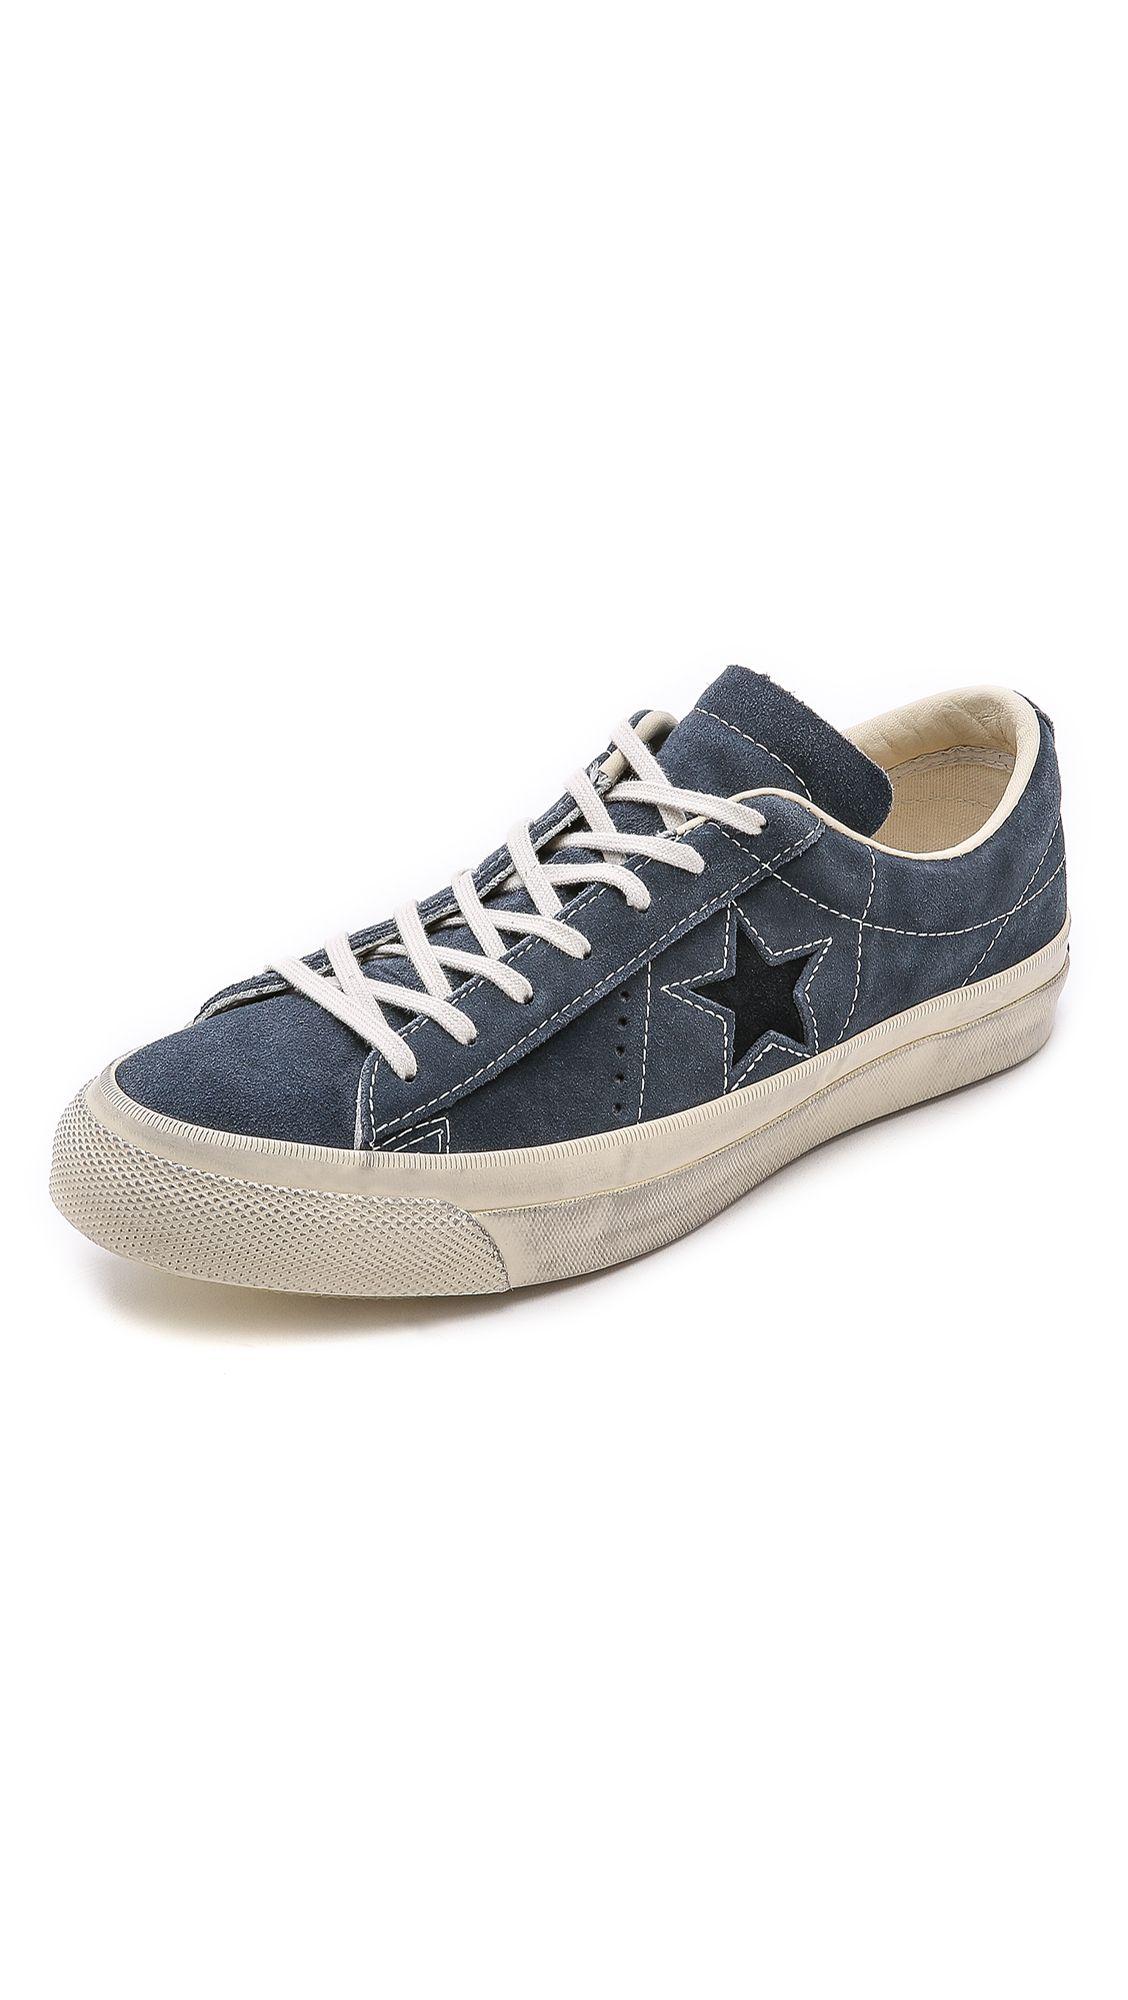 cbcecad1a26226 Converse x John Varvatos One Star Sneakers